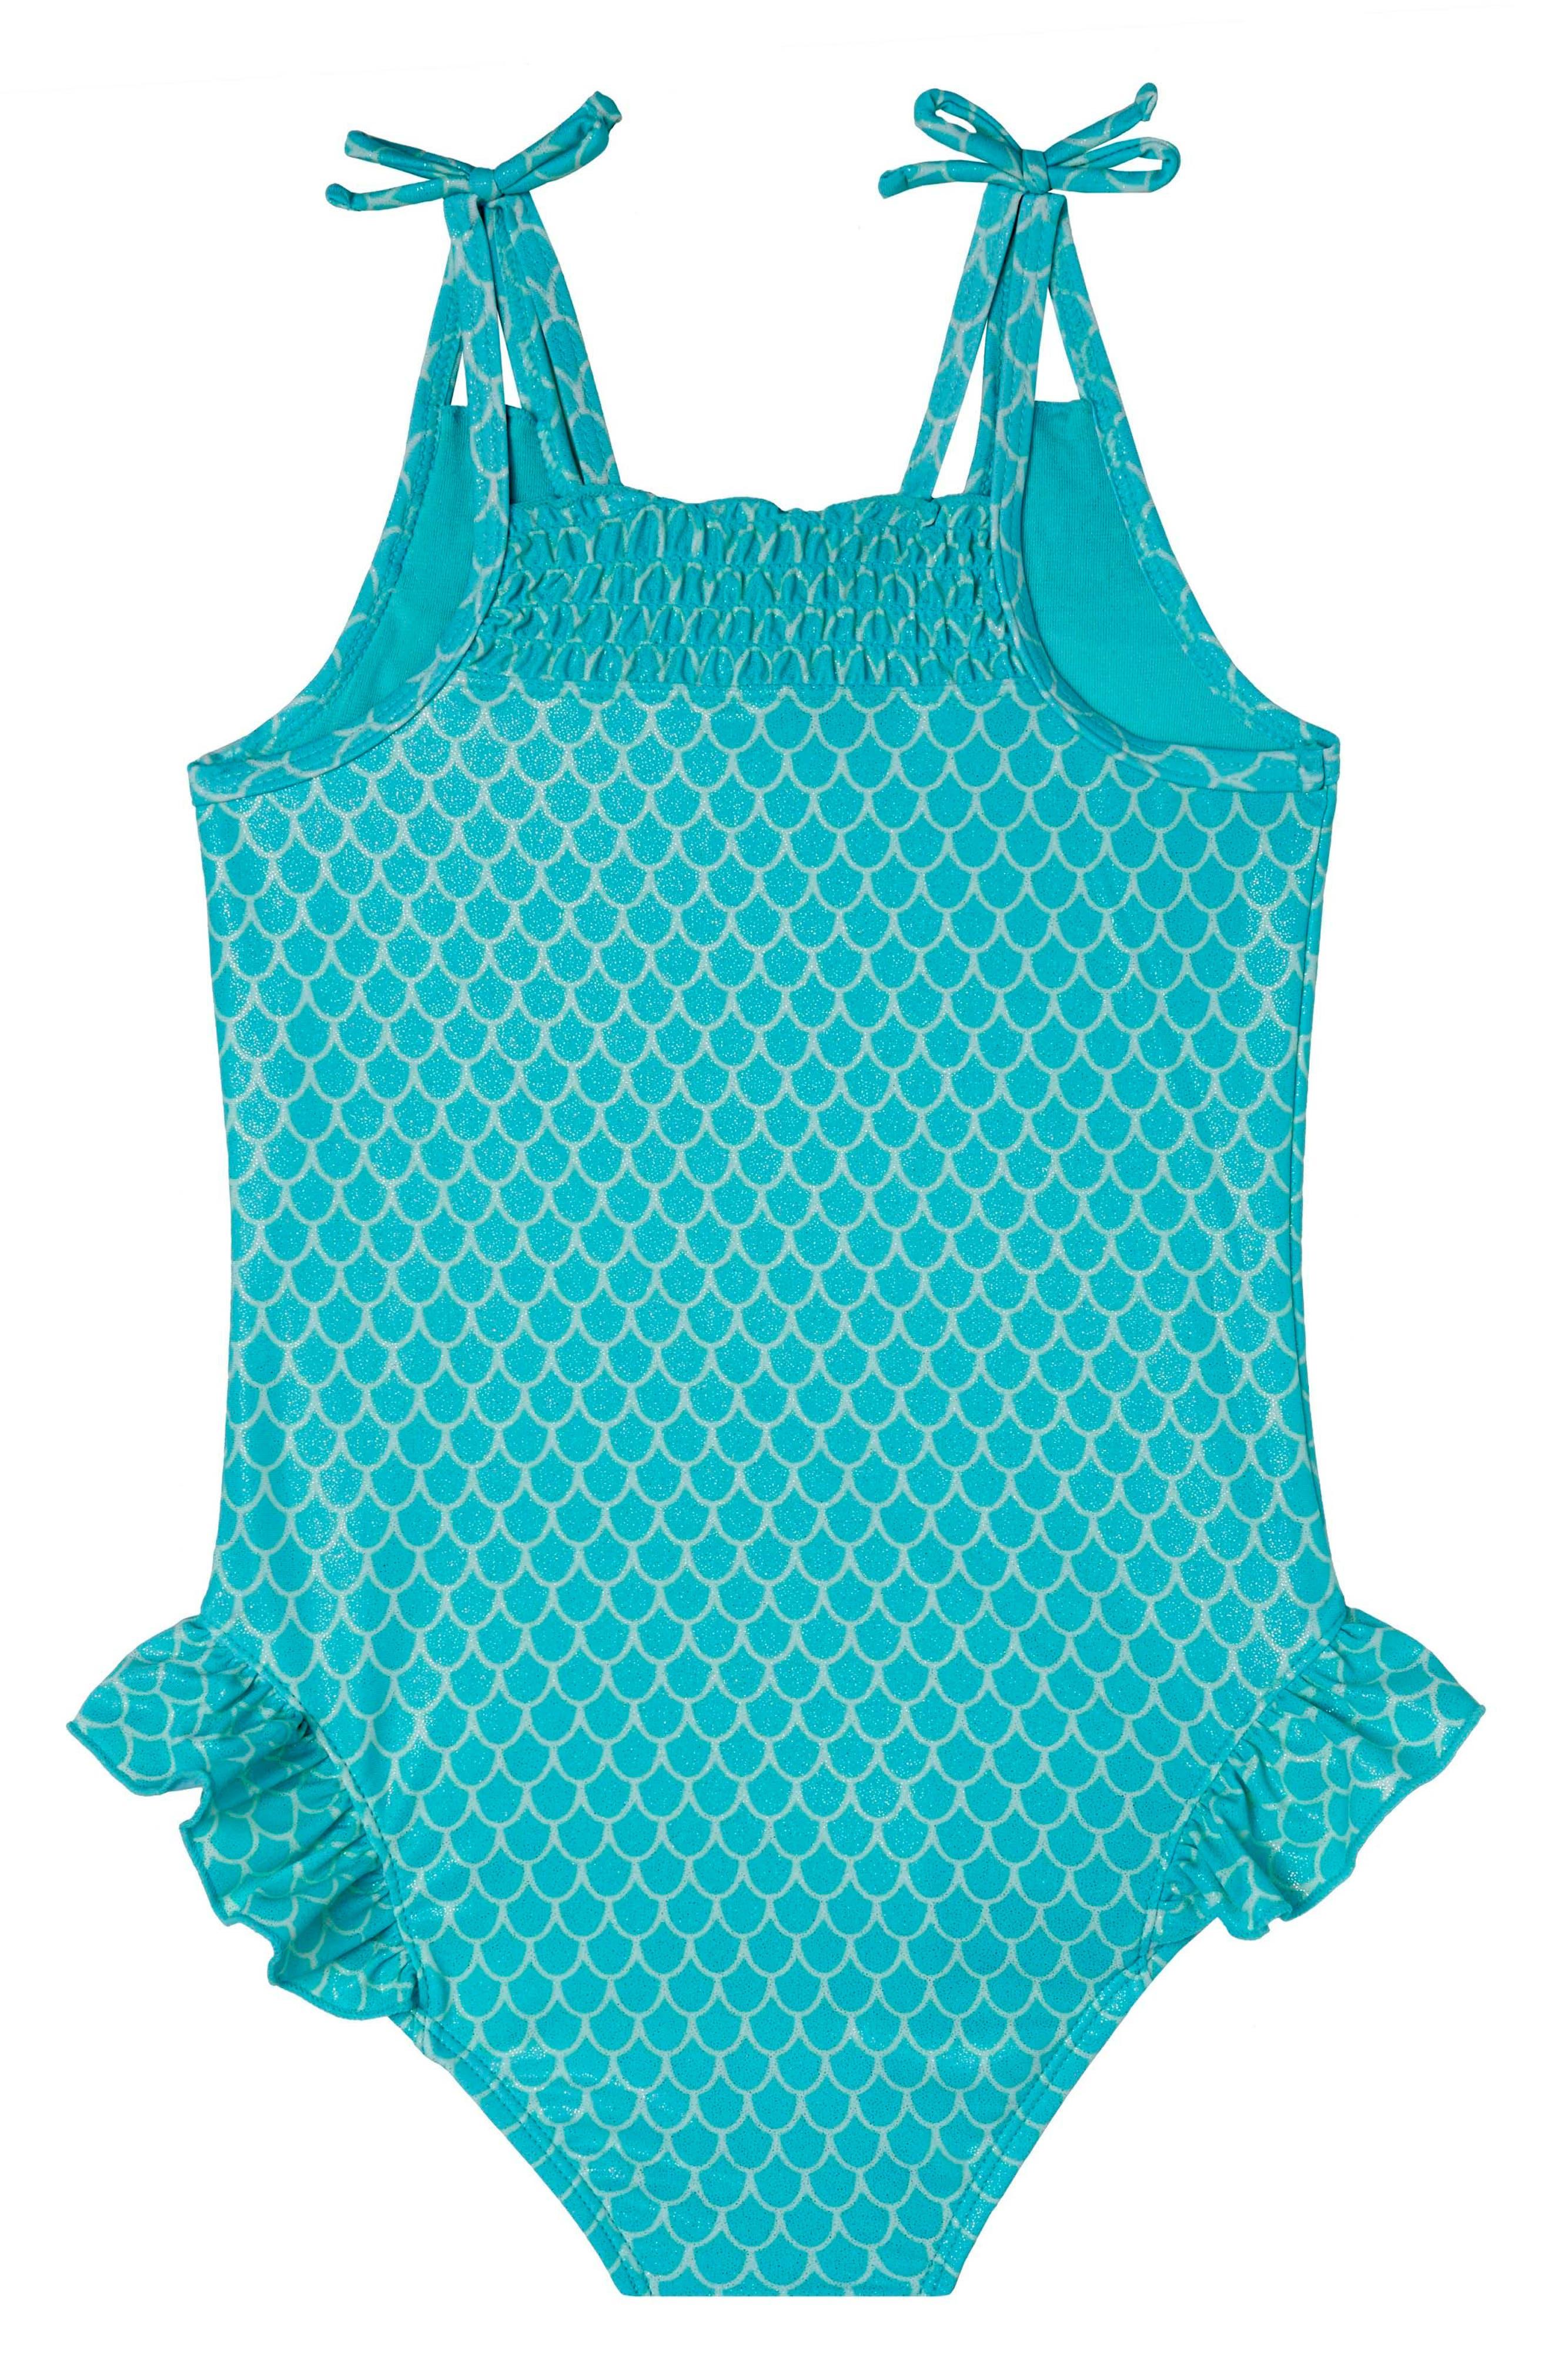 Alternate Image 2  - Hula Star Mermaid Princess One-Piece Swimsuit (Toddler Girls & Little Girls)